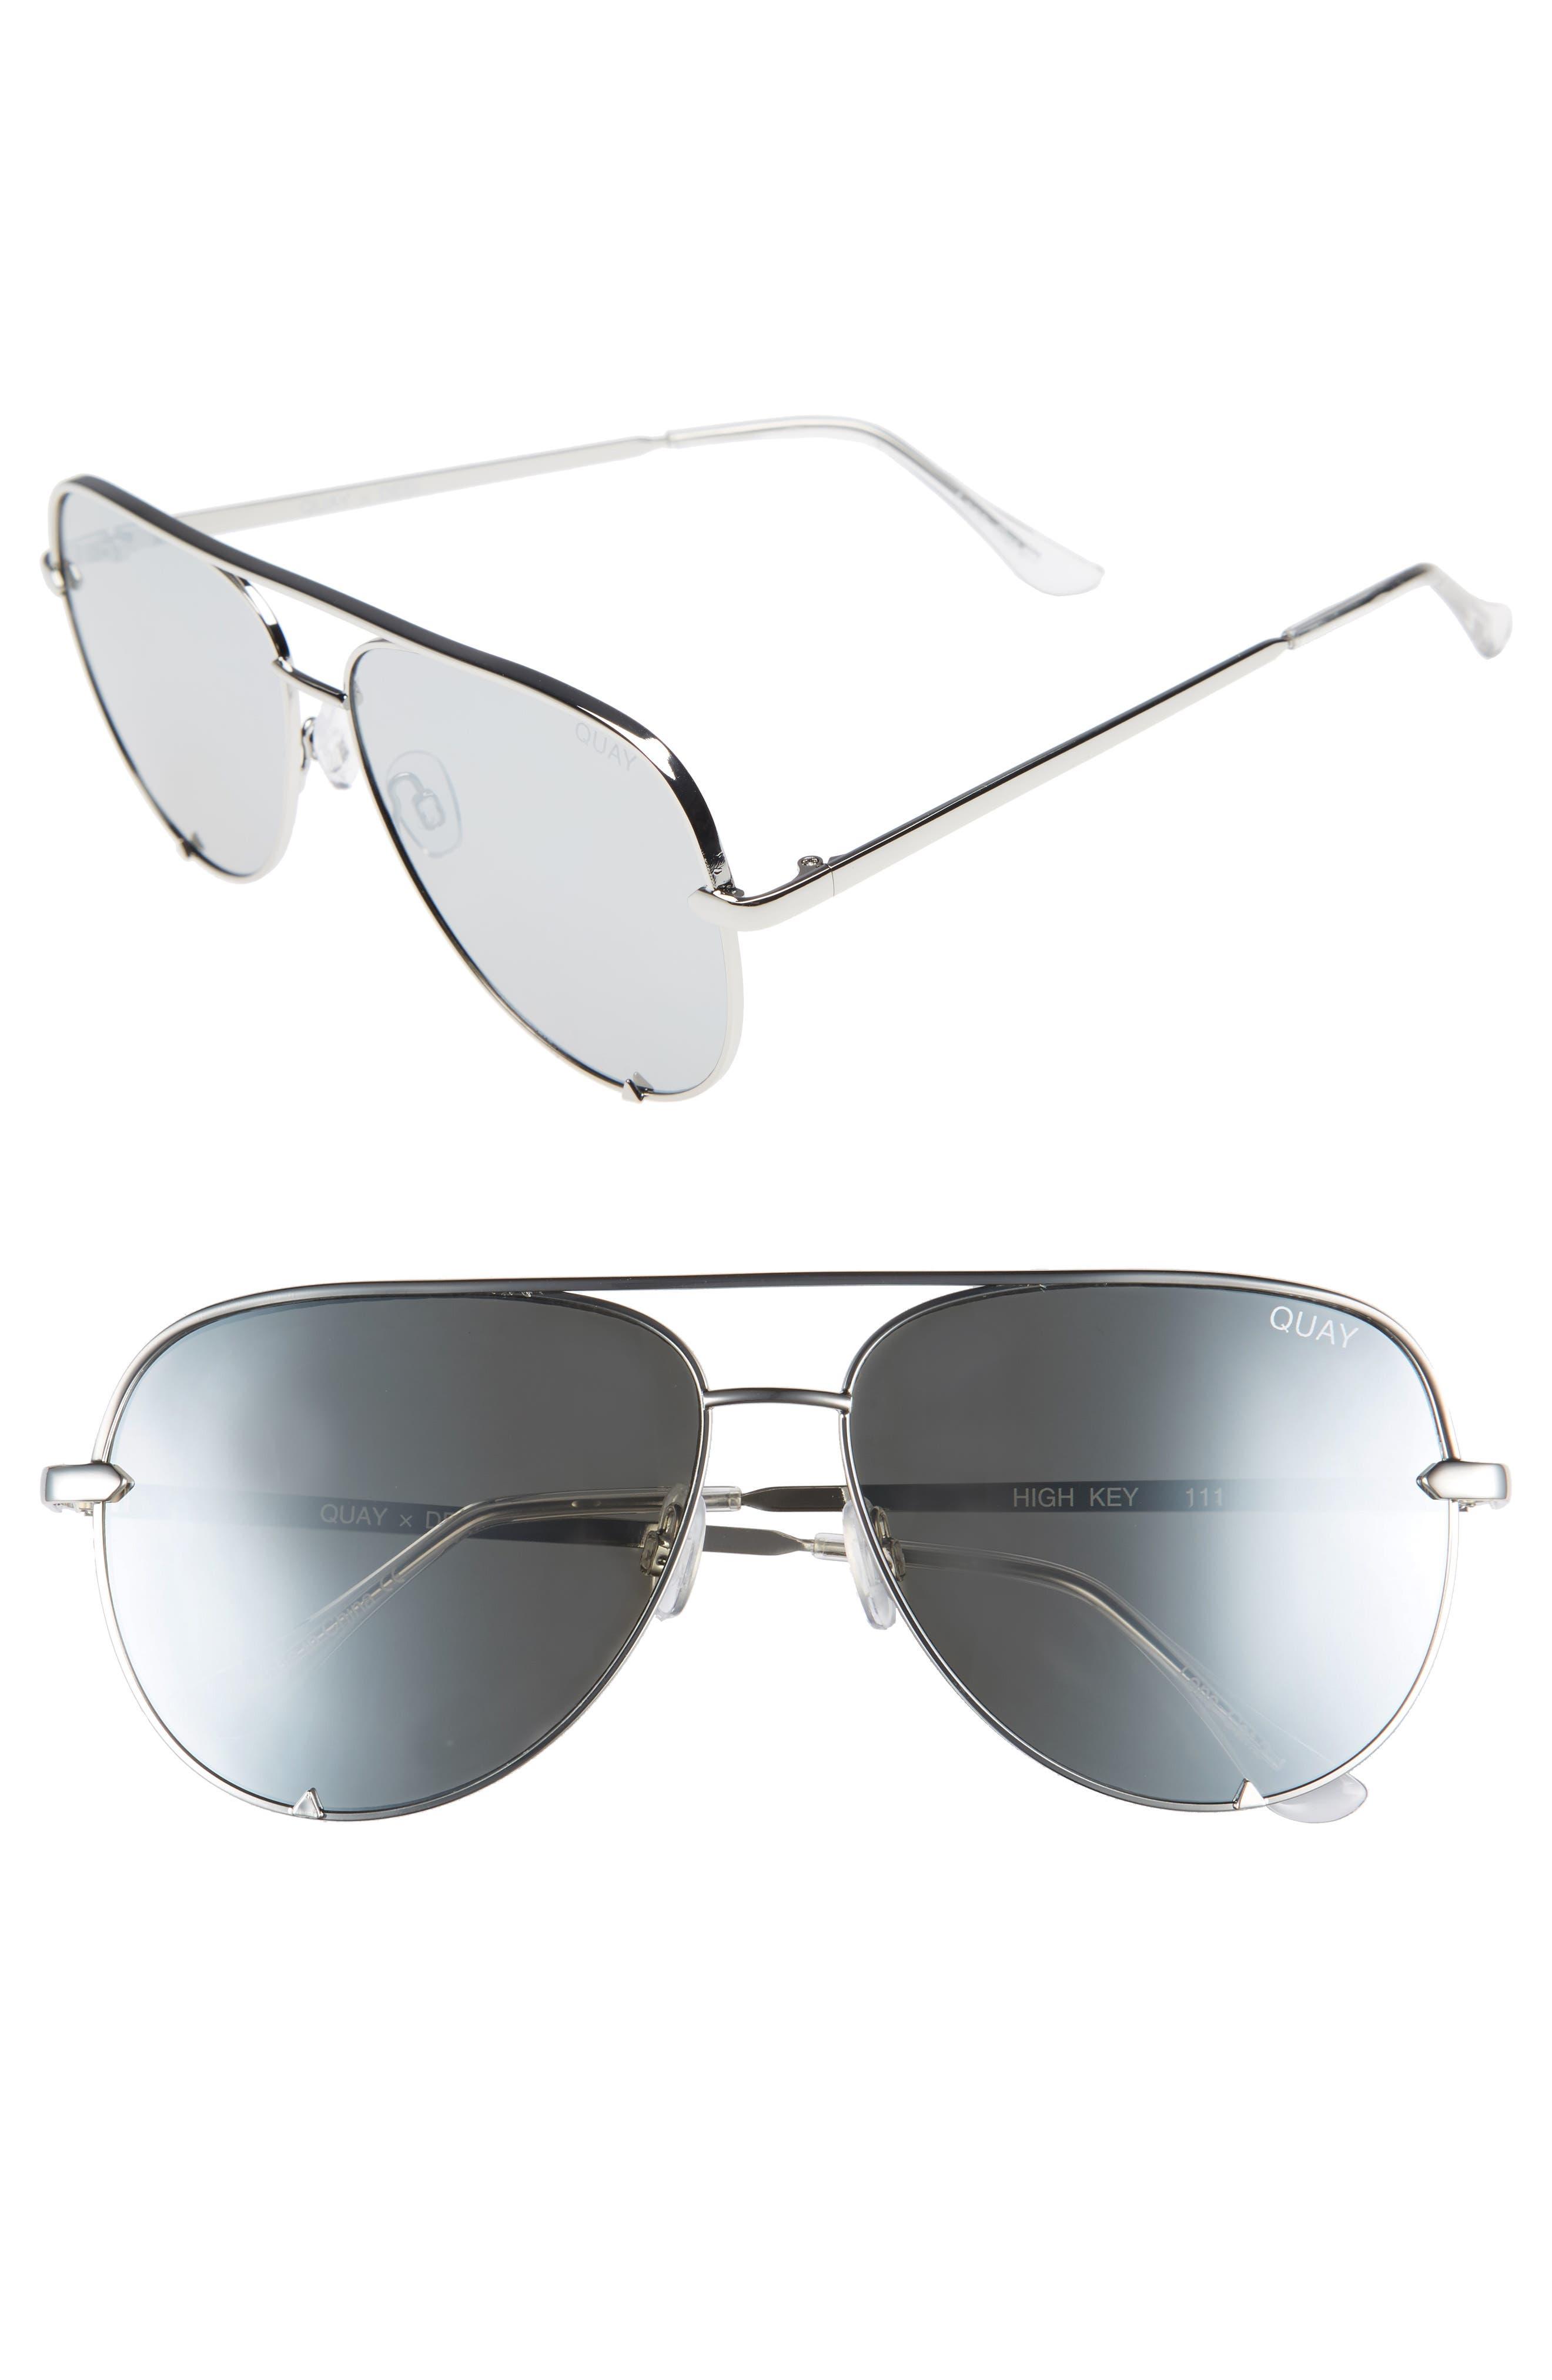 Alternate Image 1 Selected - Quay Australia x Desi Perkins 'High Key' 62mm Aviator Sunglasses